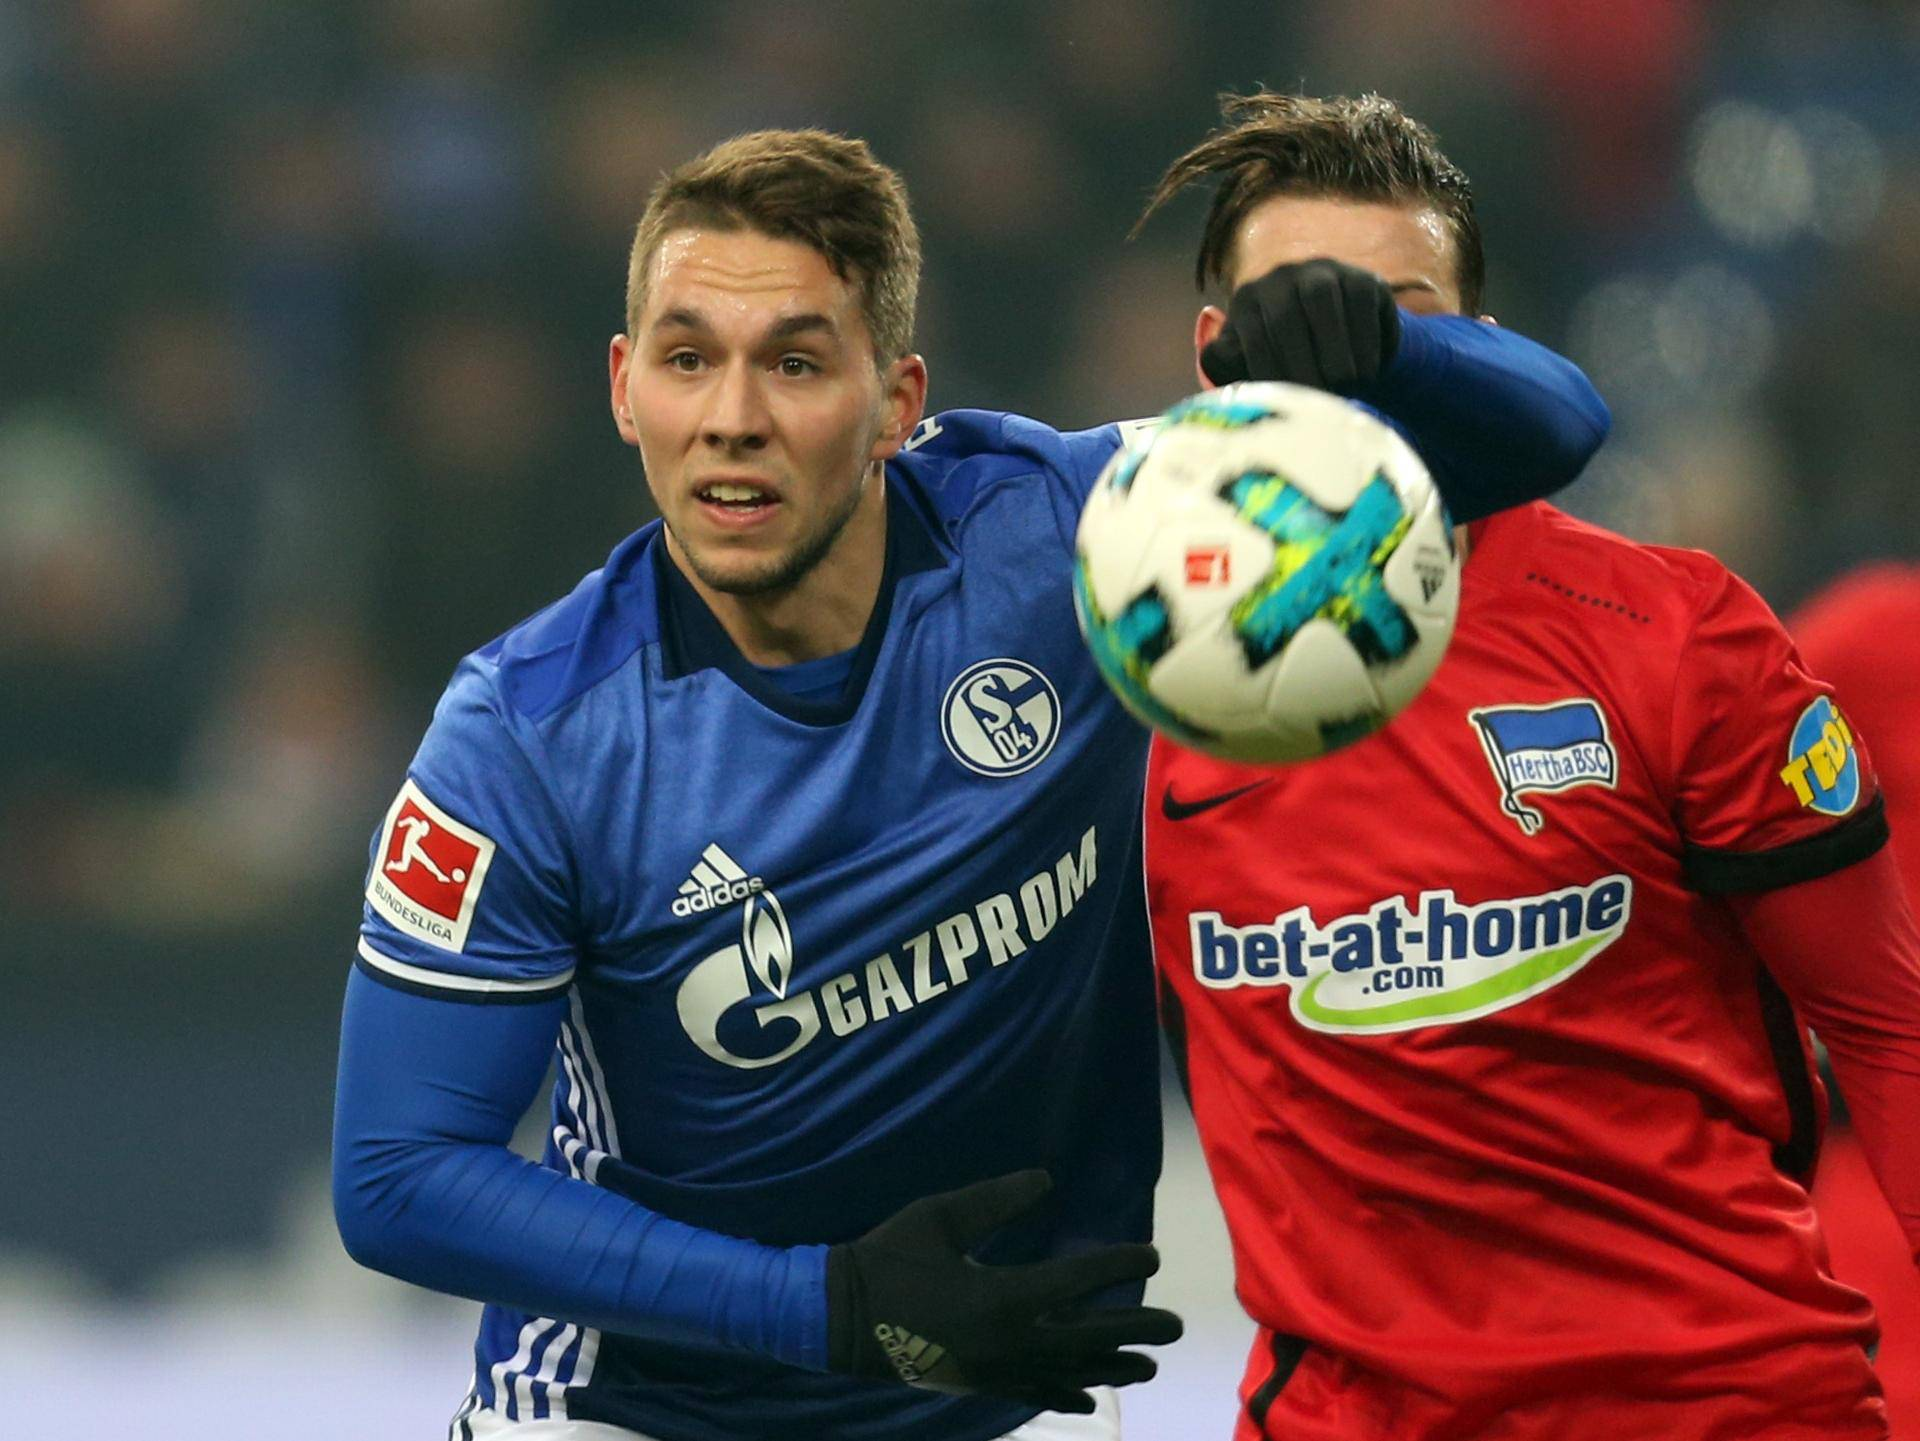 Schalke 04 vs Hertha BSC